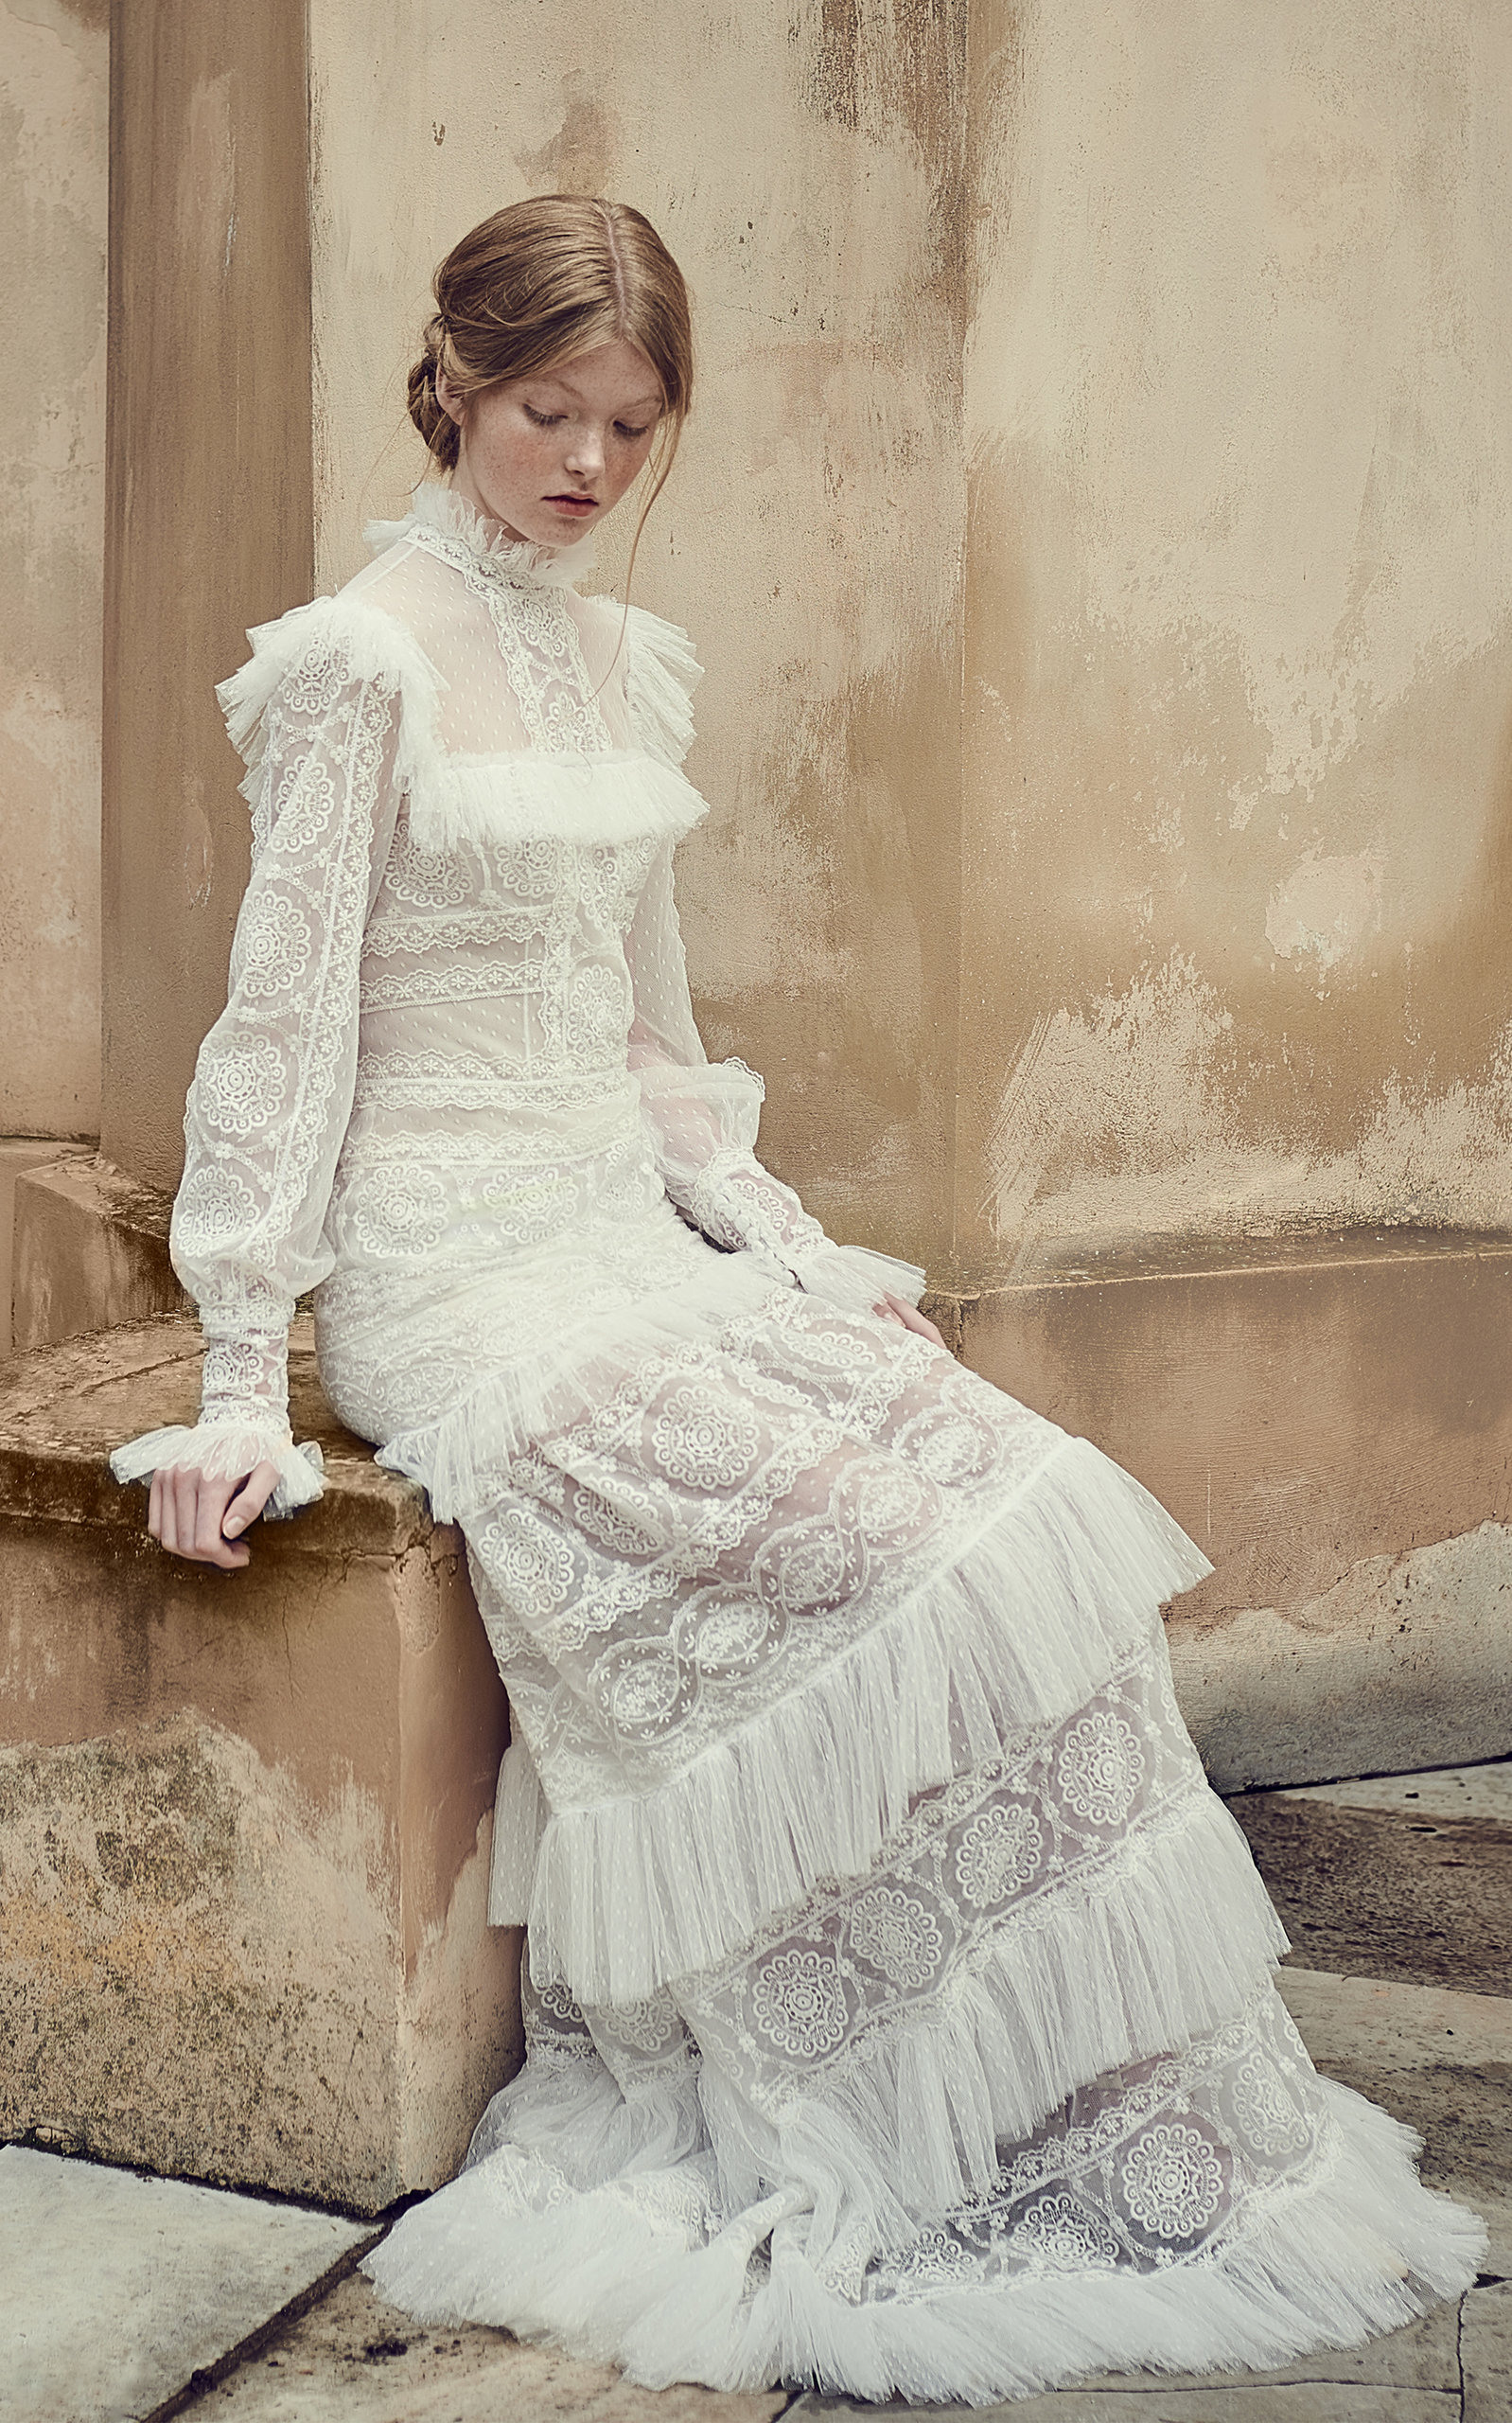 COSTARELLOS BRIDAL Mock-Neck Ruffled Mesh Dress in White